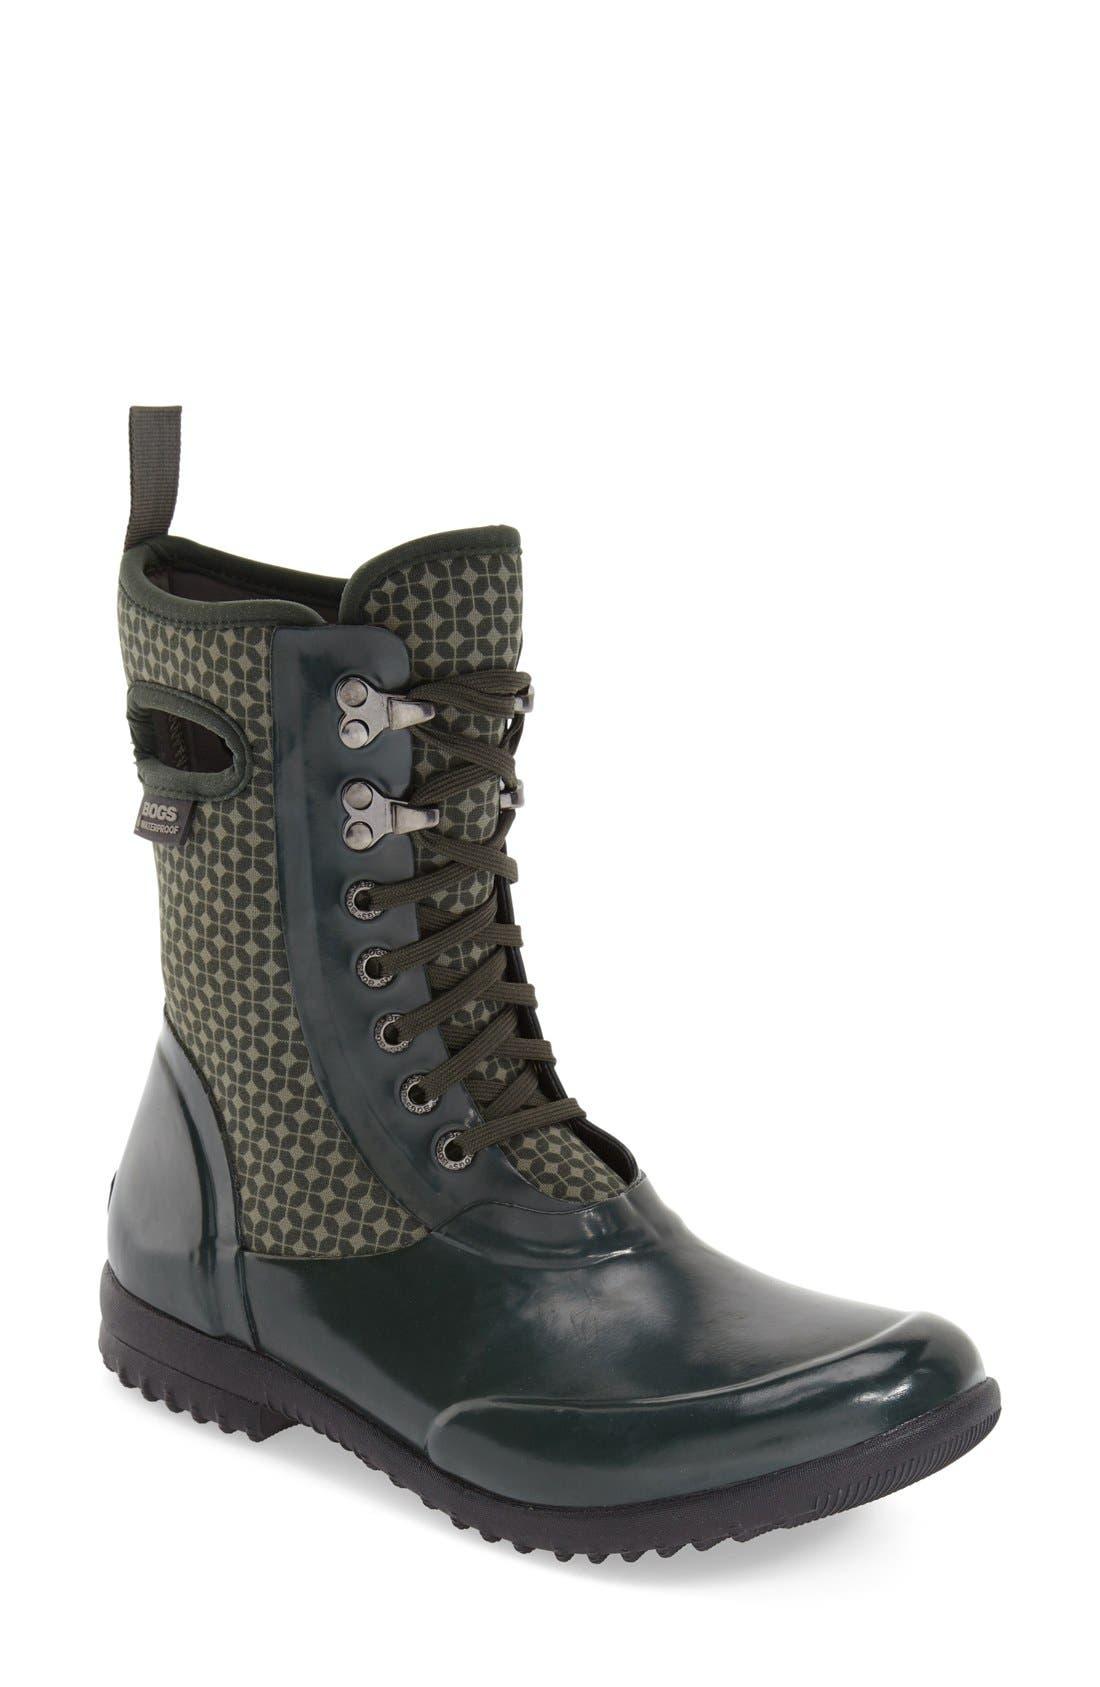 BOGS 'Sidney Cravat' Lace-Up Waterproof Boot